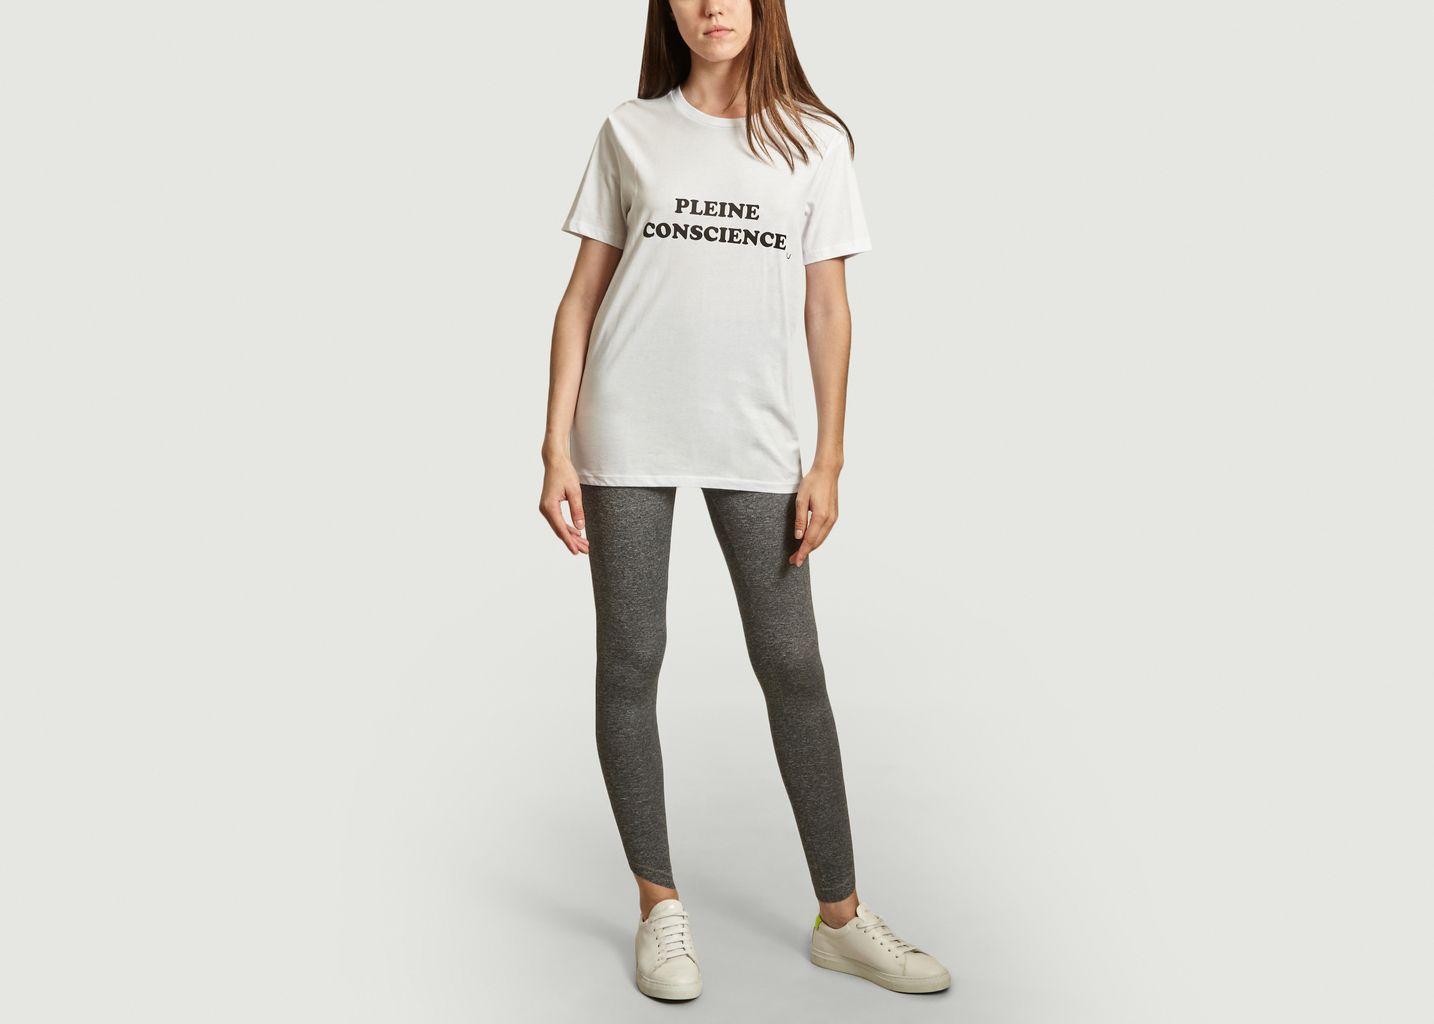 T-shirt Pleine Conscience - YUJ Paris